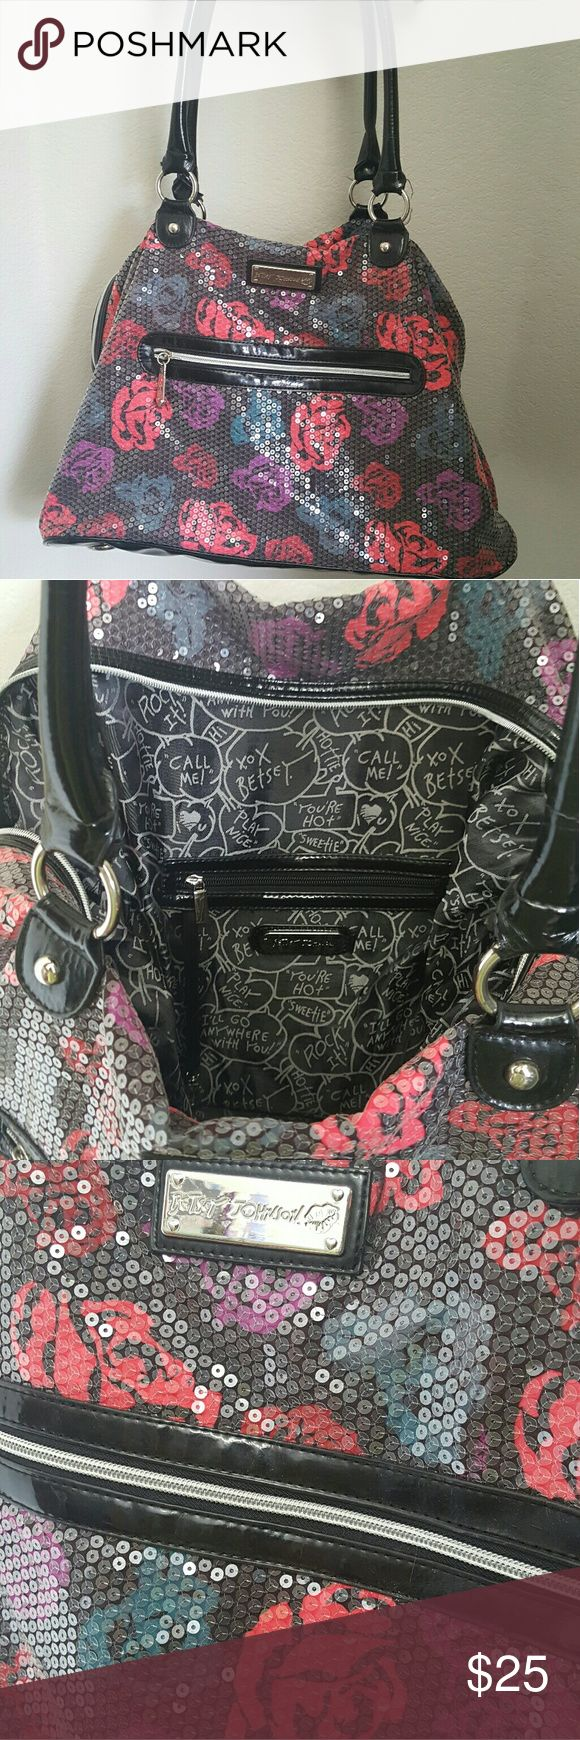 Selling this Betsey Johnson Weekender Tote on Poshmark! My username is: jessica24lee. #shopmycloset #poshmark #fashion #shopping #style #forsale #Betsey Johnson #Handbags